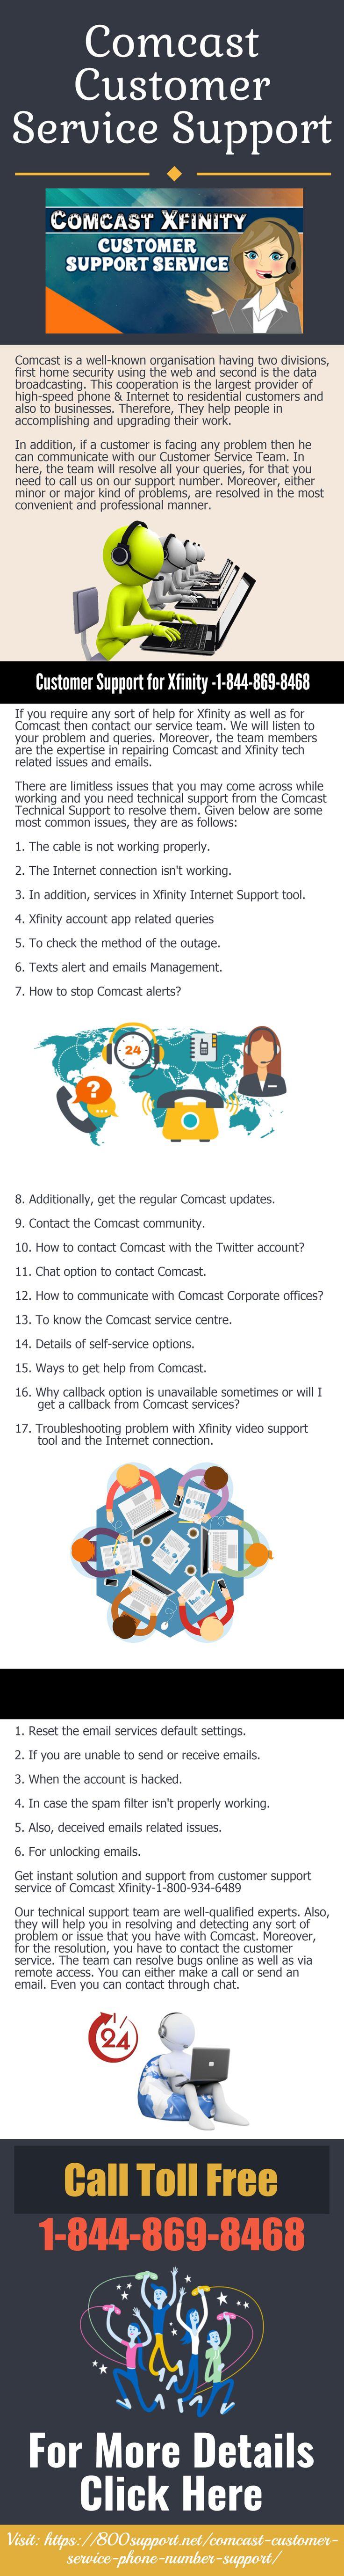 comcast residential customer service - Monza berglauf-verband com